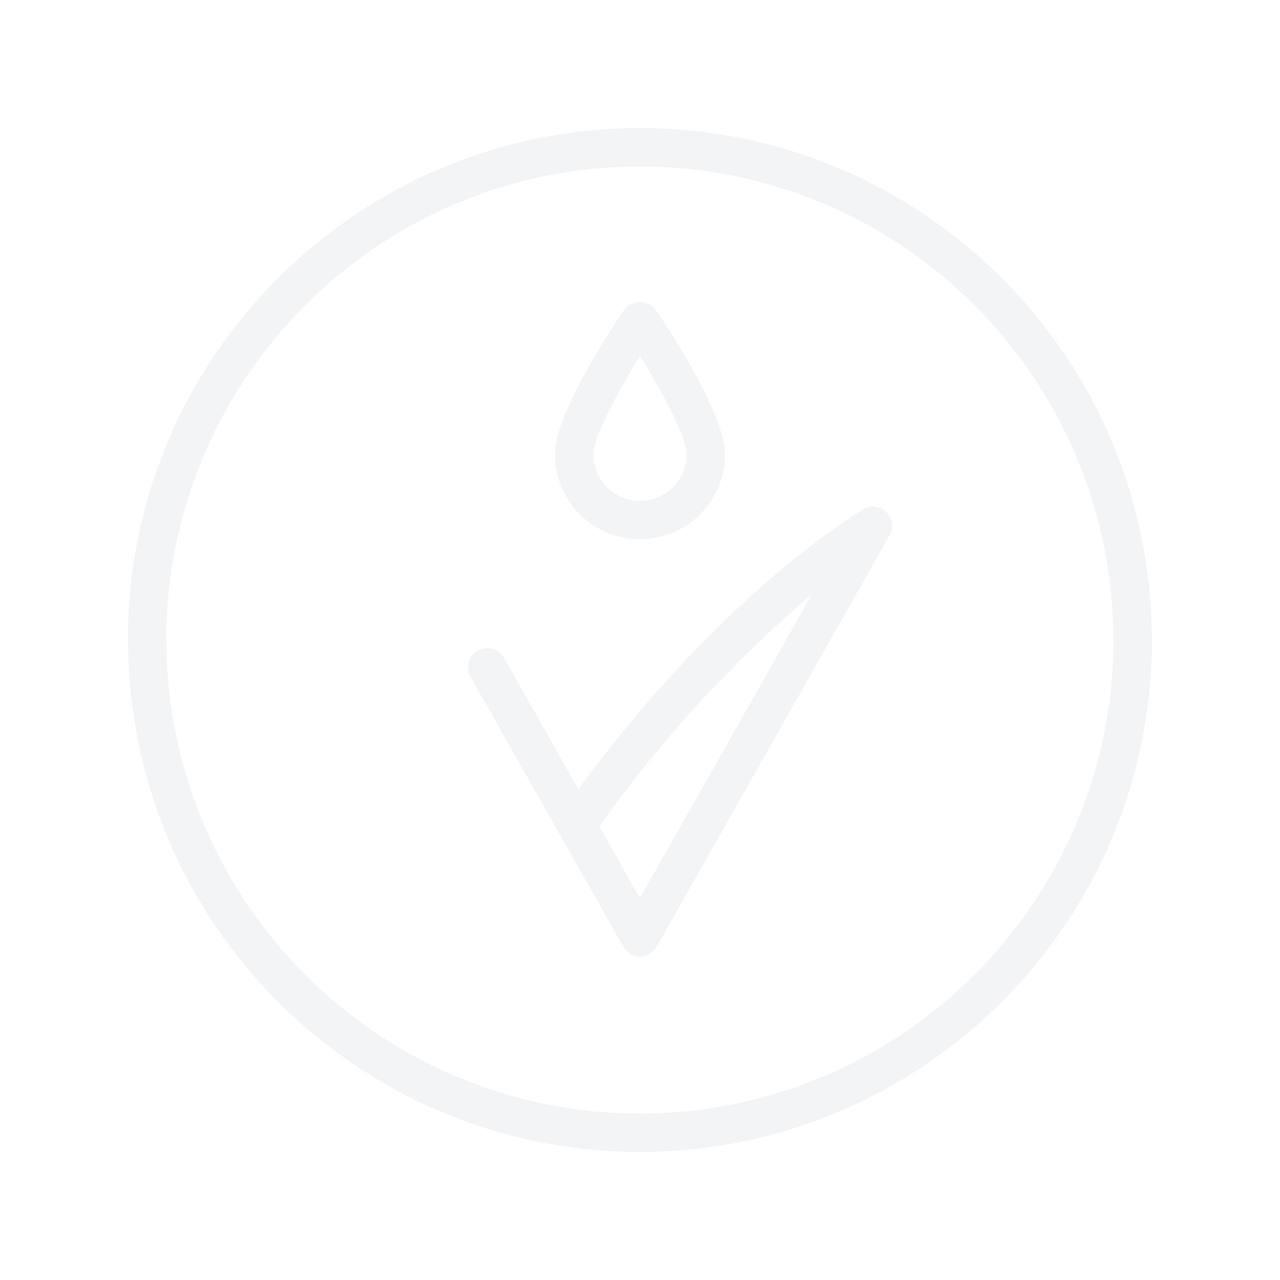 IDUN Minerals Eyebrow Pencil Pil 1.2g